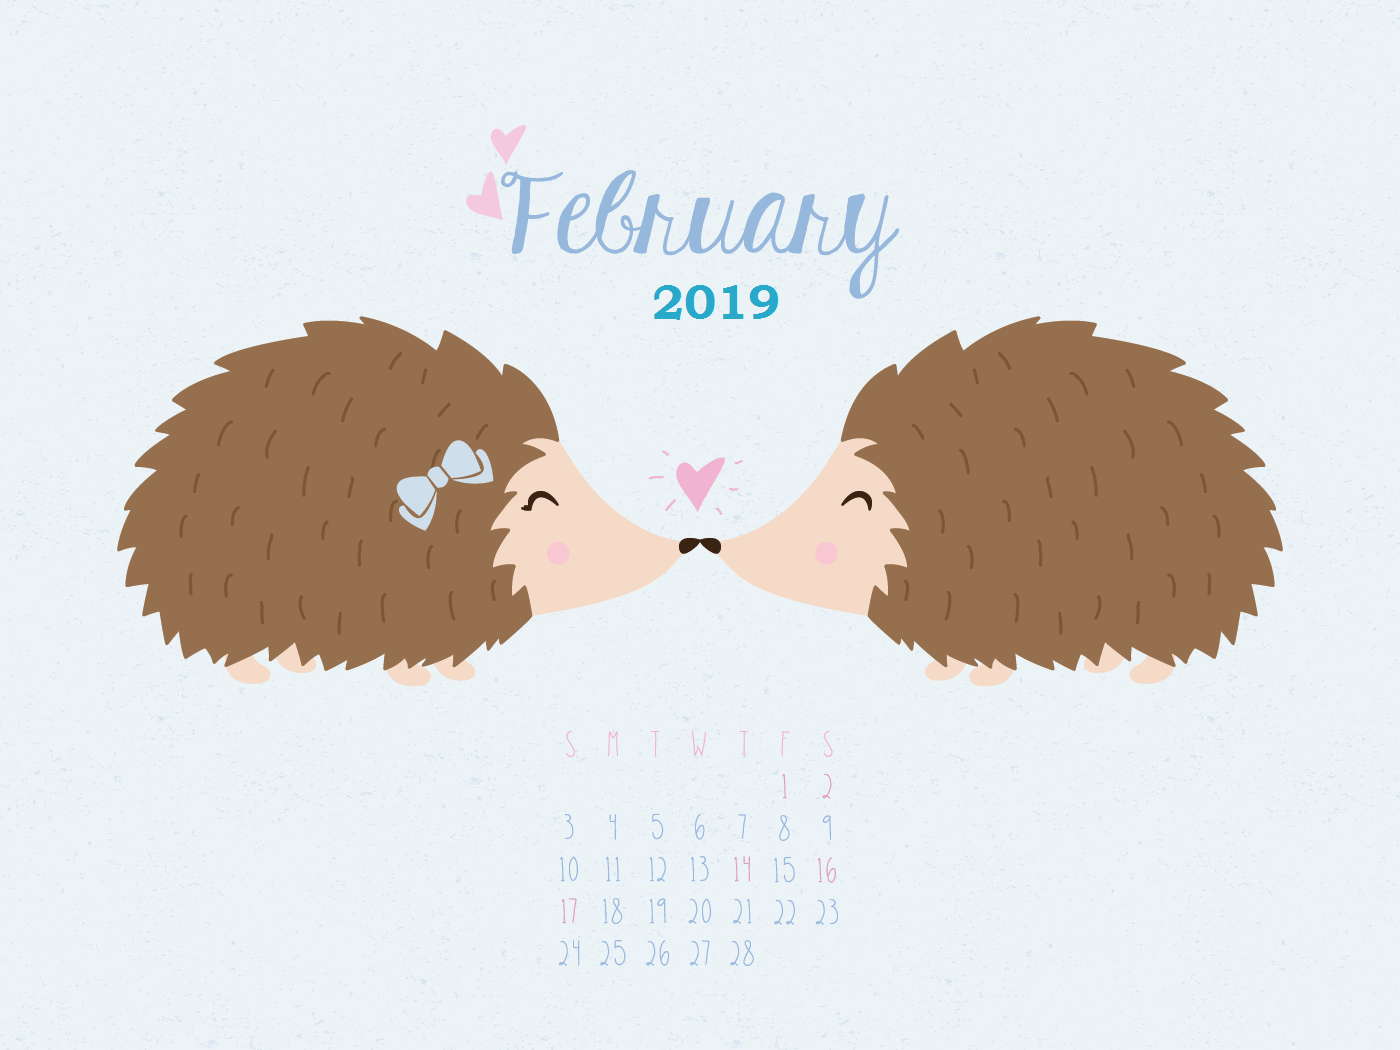 Feb 2019 Calendar HD Wallpaper February2019 1400x1050